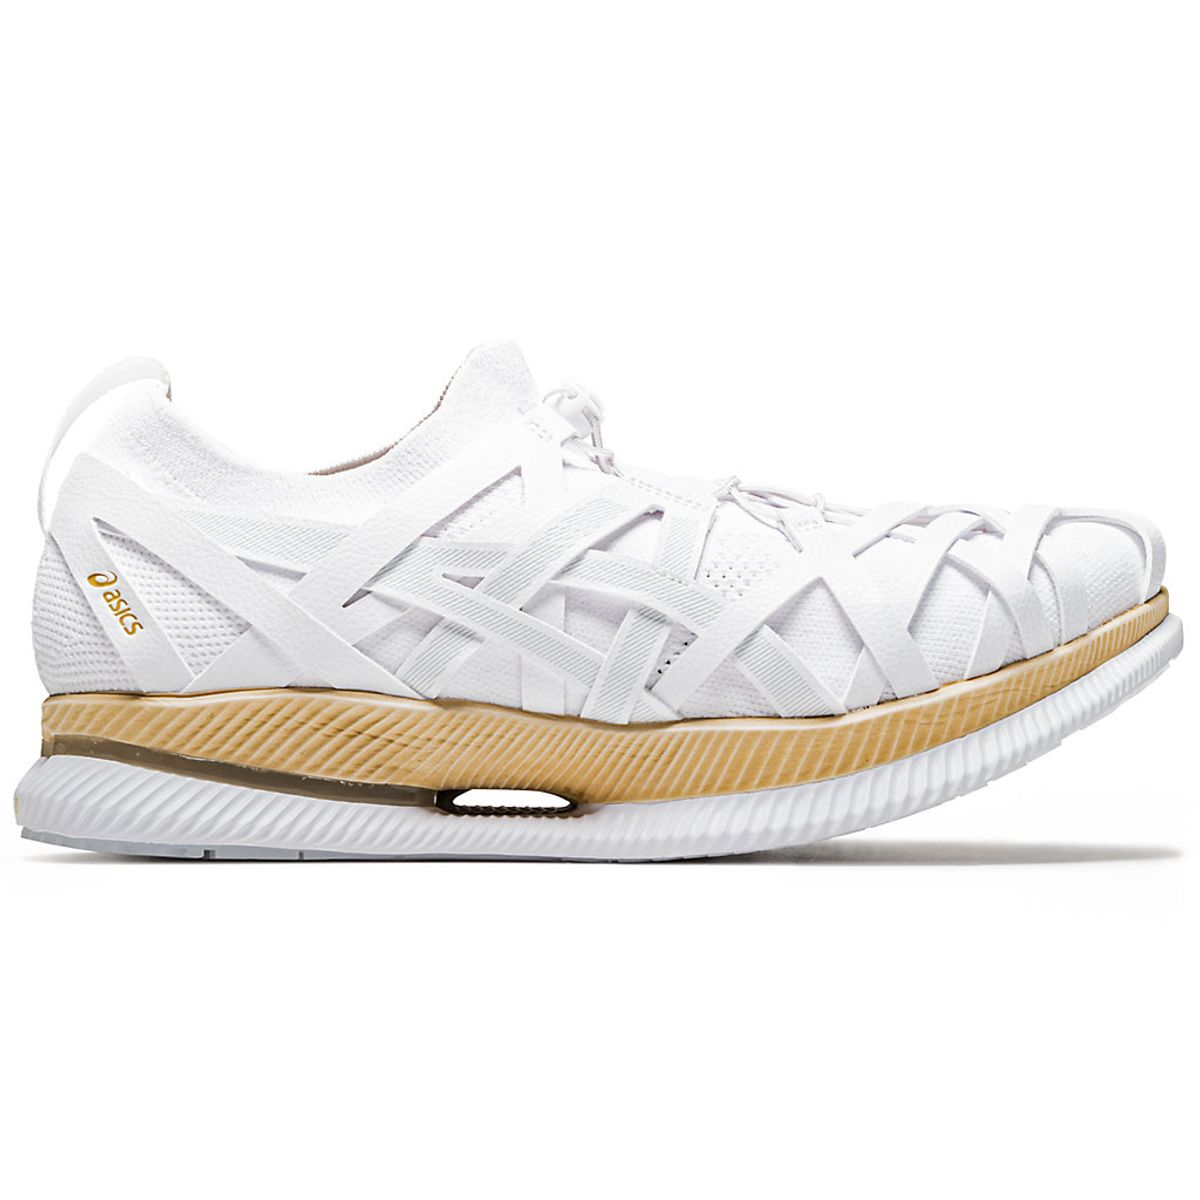 Tenis-ASICS-Metaride-x-Kengo-Kuma---Unisex---Branco